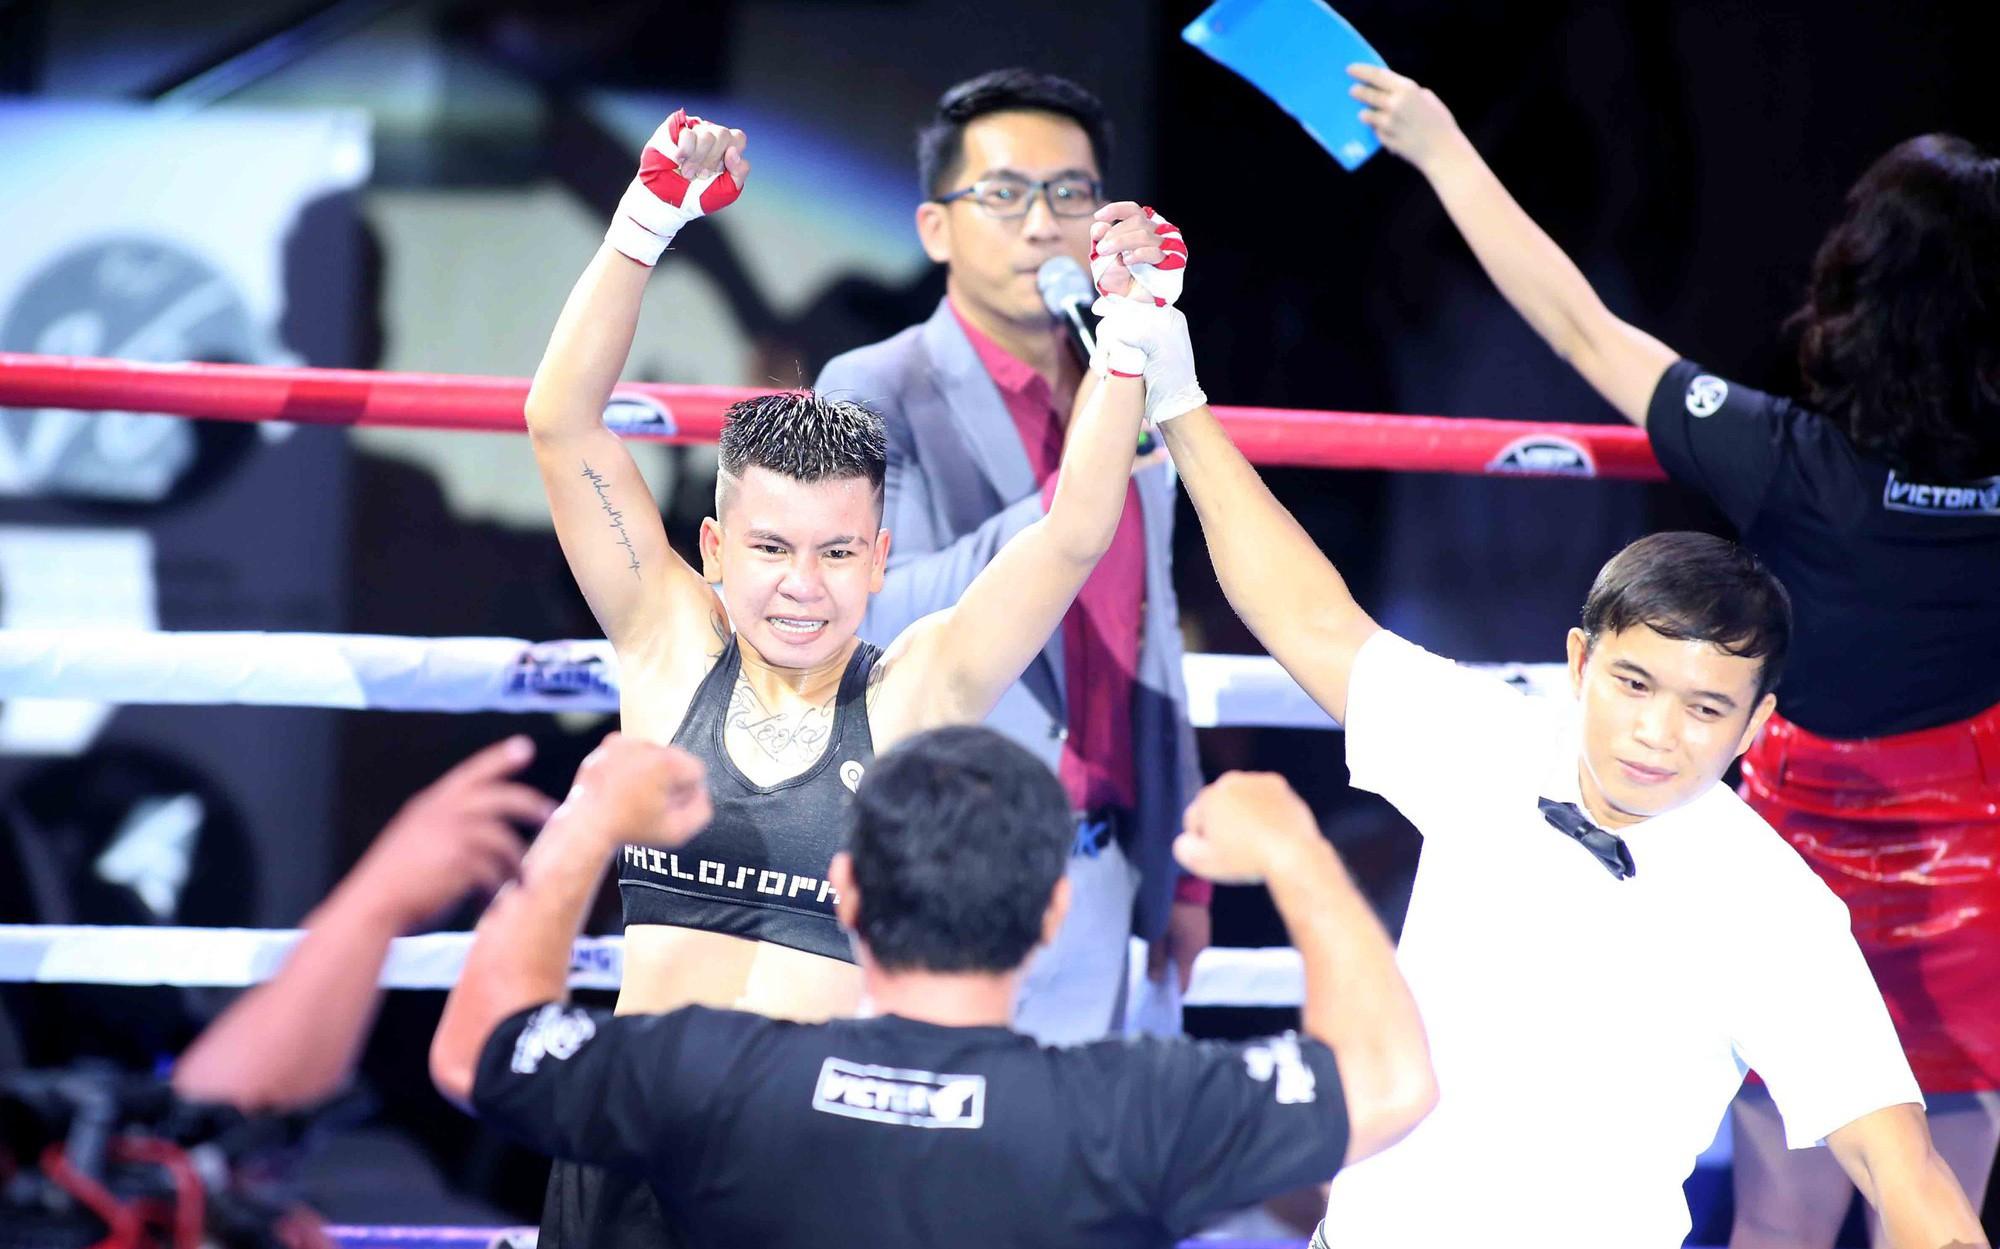 Vietnamese boxer defeats Philippine-Australian title holder in Saigon friendly tournament